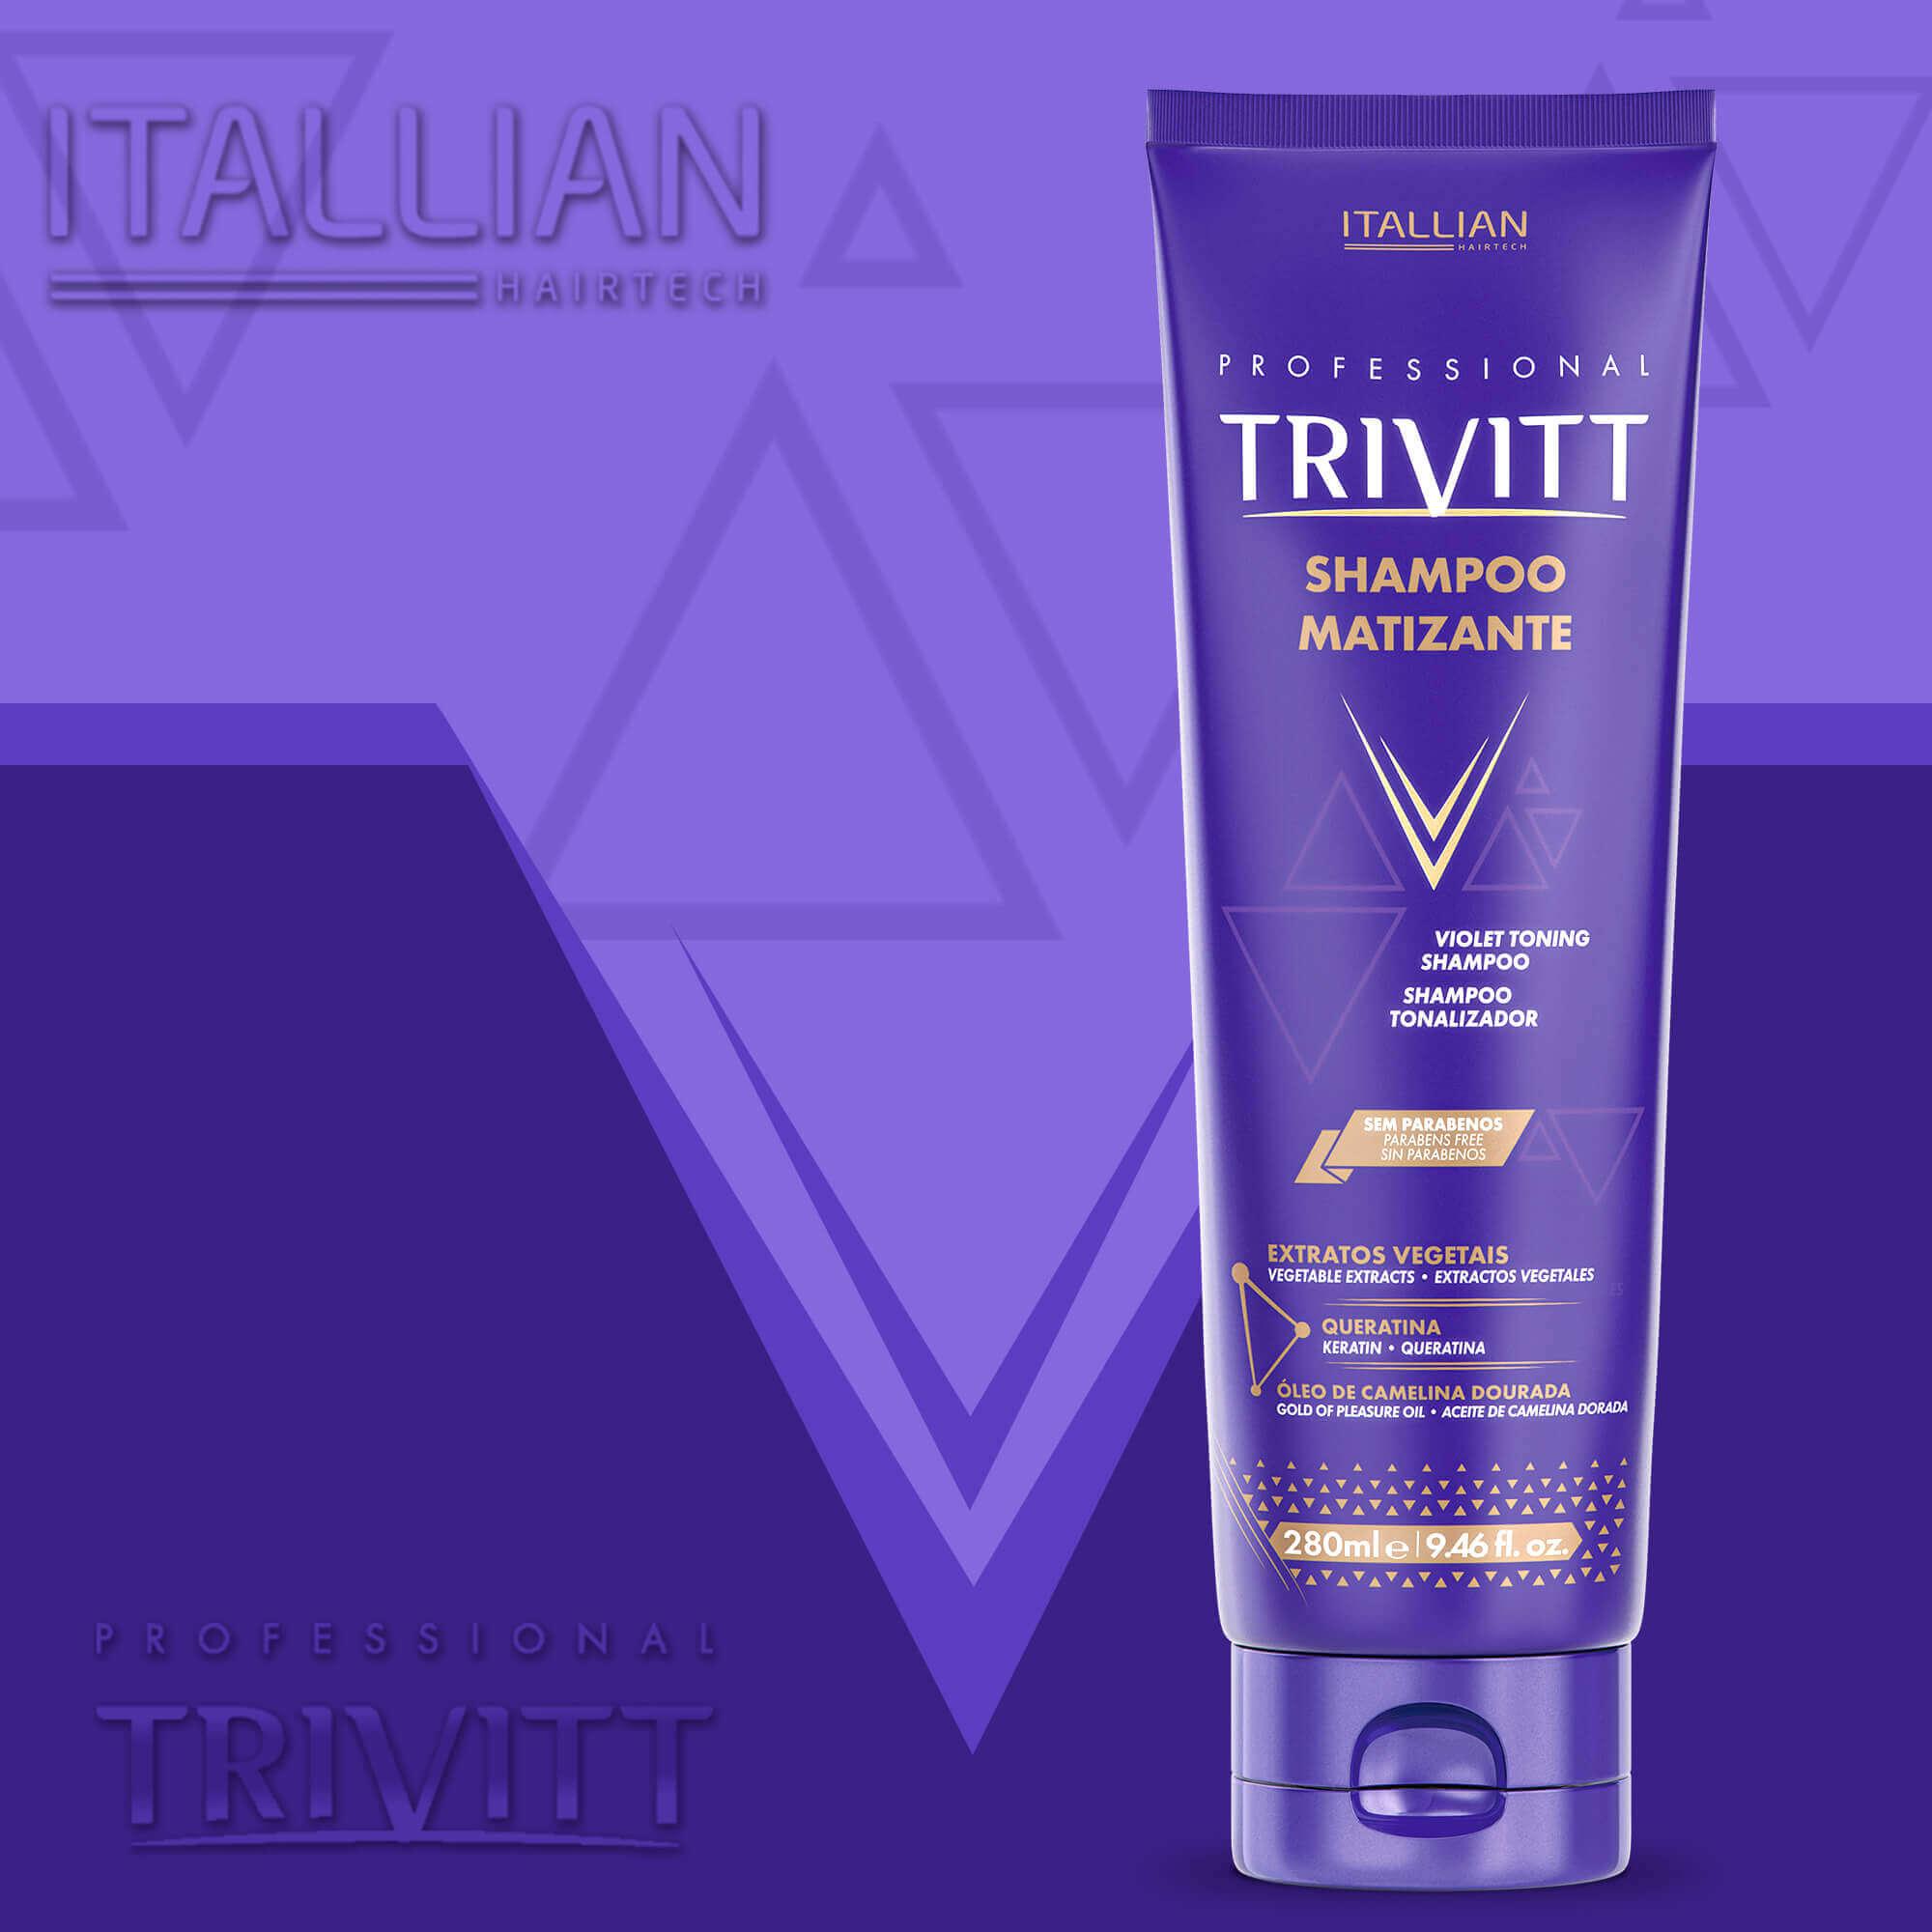 Shampoo Matizante Itallian Trivitt - 280ml